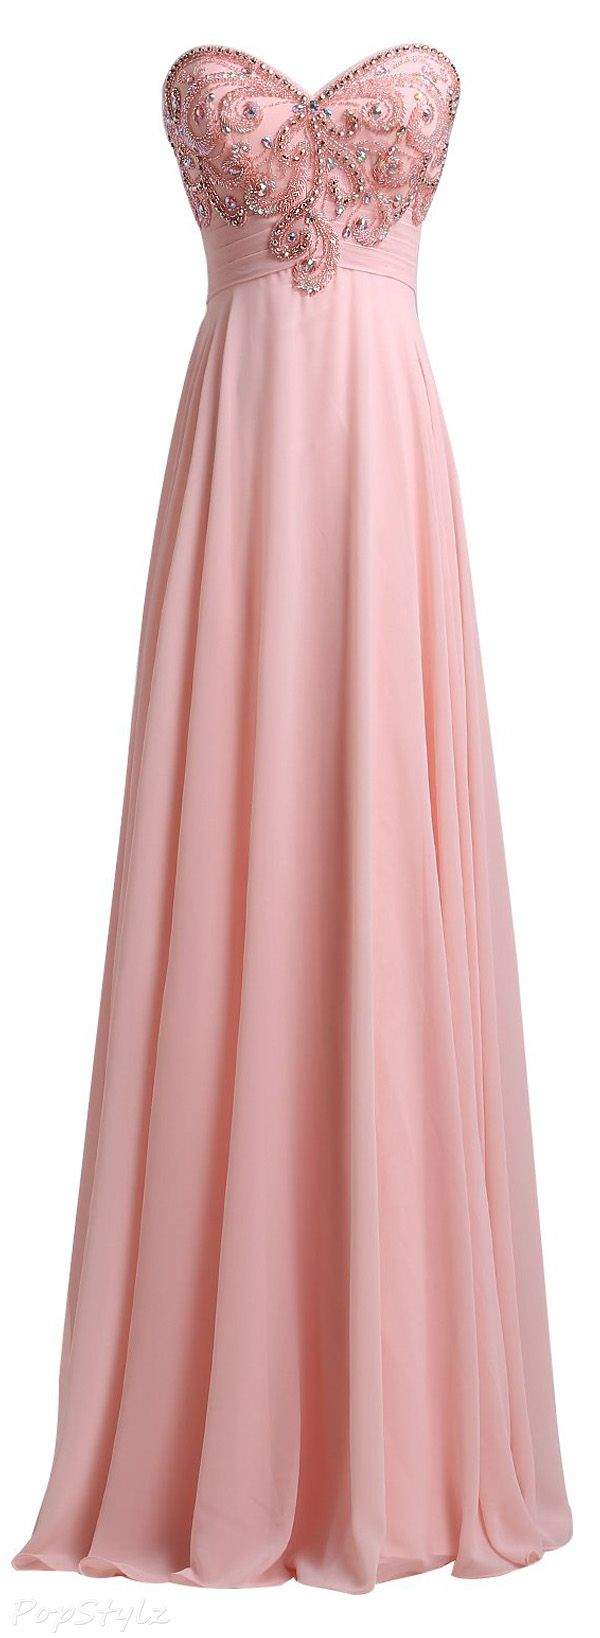 SeasonMall Chiffon A Line Sweetheart Evening Dress   Outfits ...